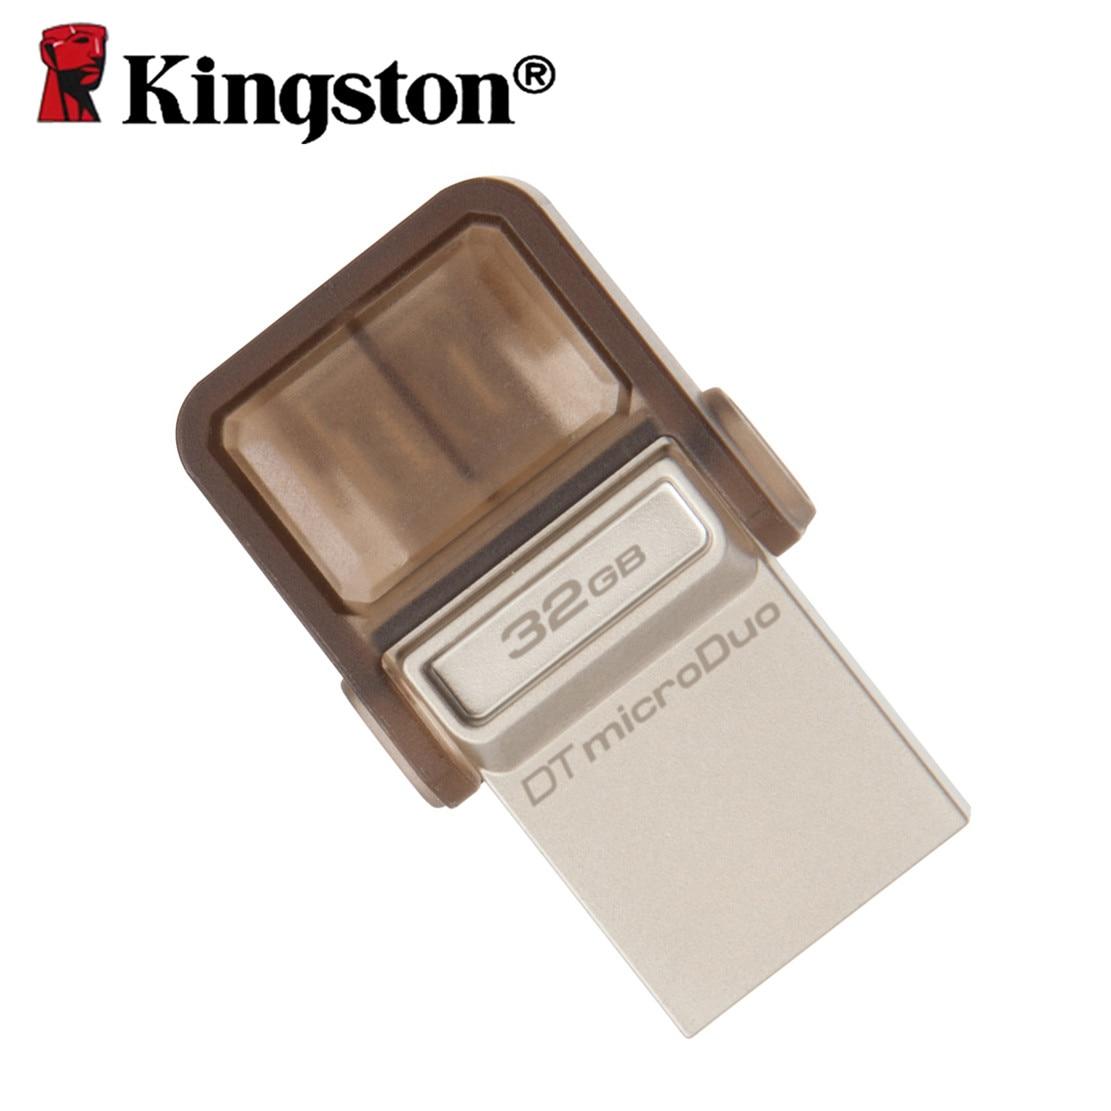 Kingston OTG usb 2.0 flash drive pendrive Smartphone Micro Memory pen drive 16 gb 32 gb 64 gb USB Portable bâton de stockage microDuo